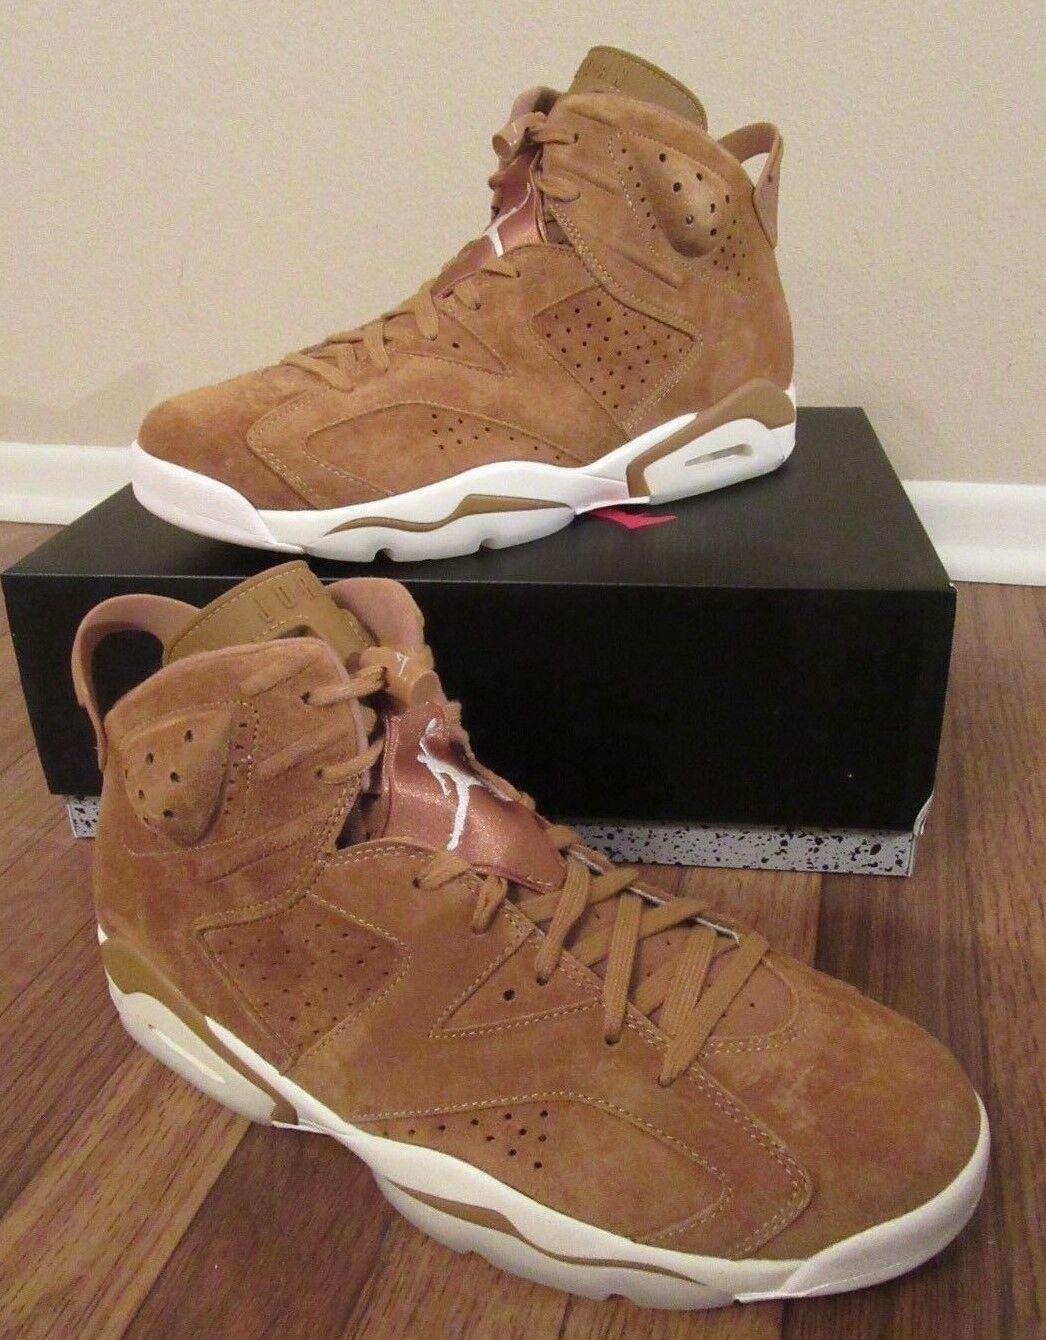 Nike Air Jordan 6 Retro VI Size 11 Golden Harvest Flax Wheat 384664 705 New NIB